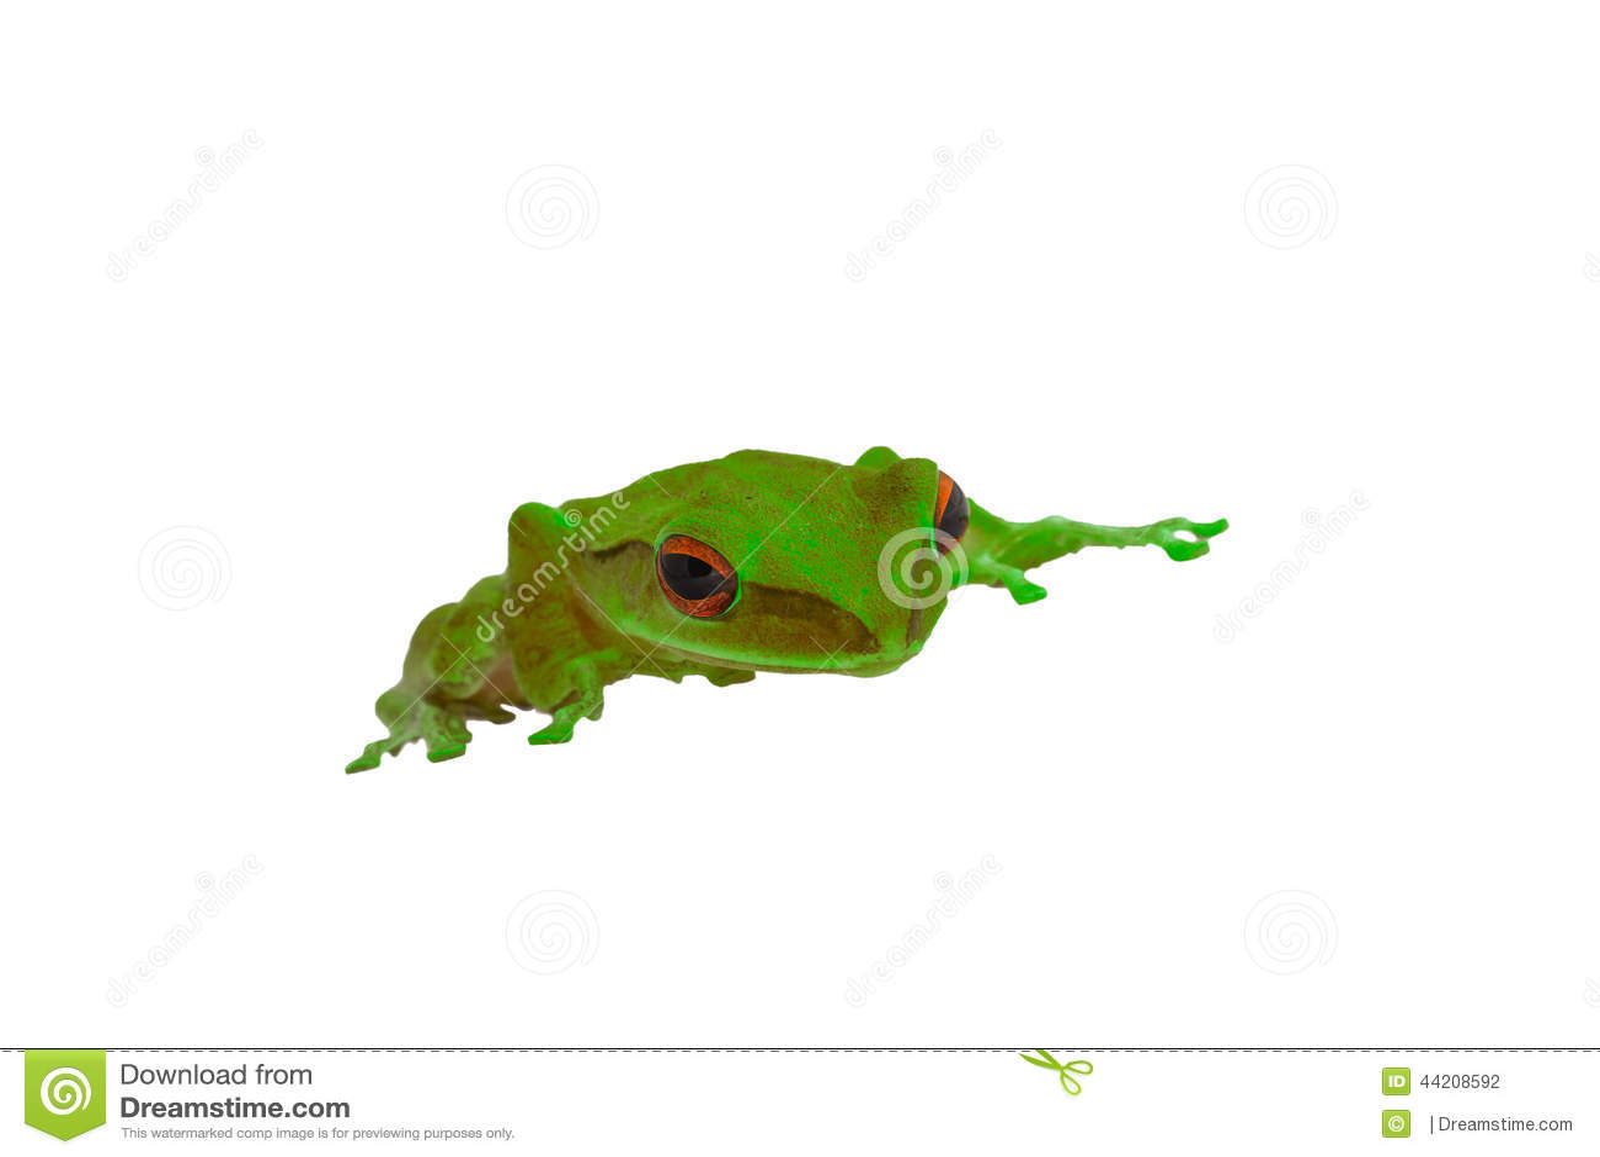 Groene kikker rode ogen stock foto's– 46 groene kikker rode ogen ...